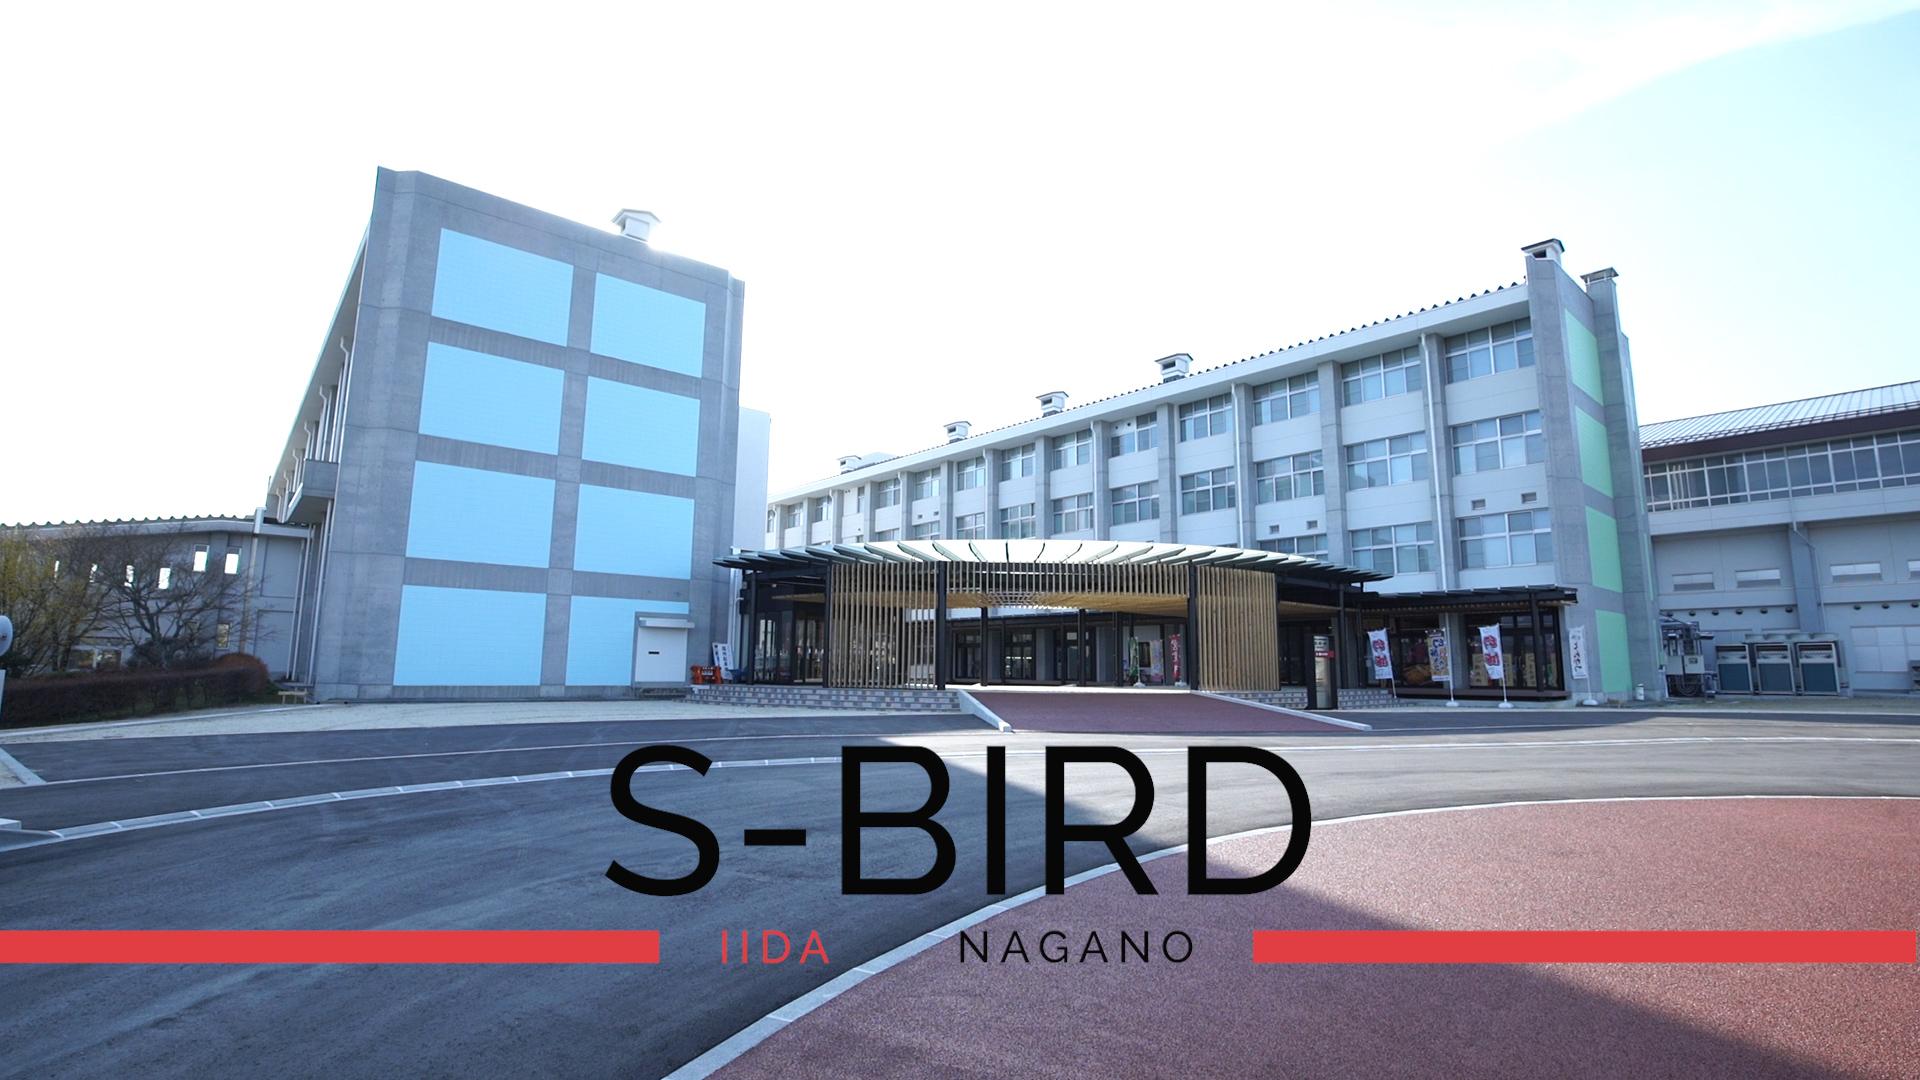 S-Bird 長野県で一番大きな黒板でARTしよう!